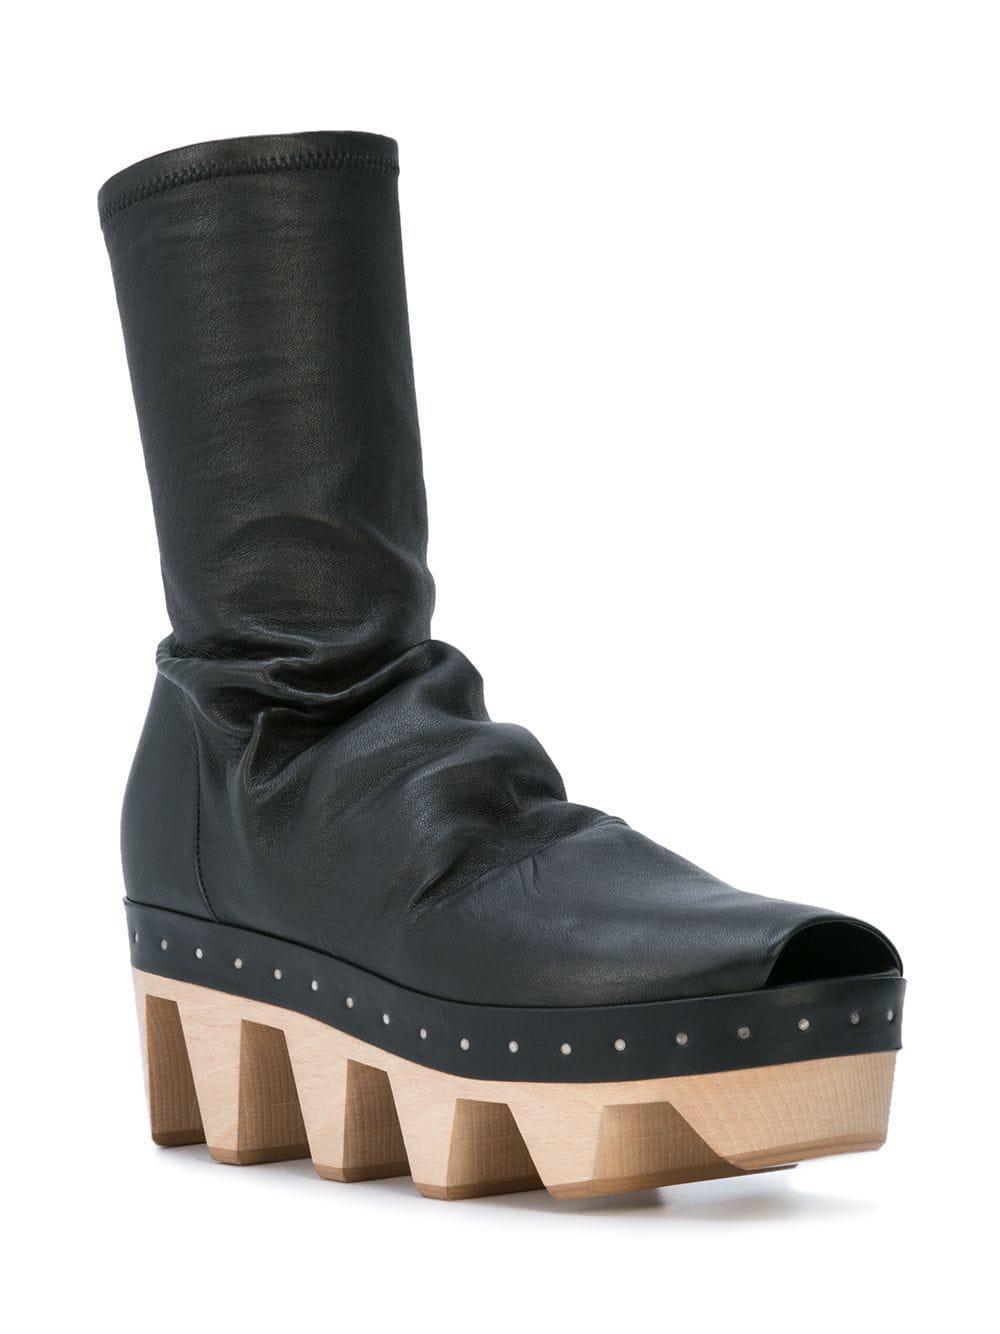 2cc9eea805e6 Lyst - Rick Owens Geta Sock Shoes in Black